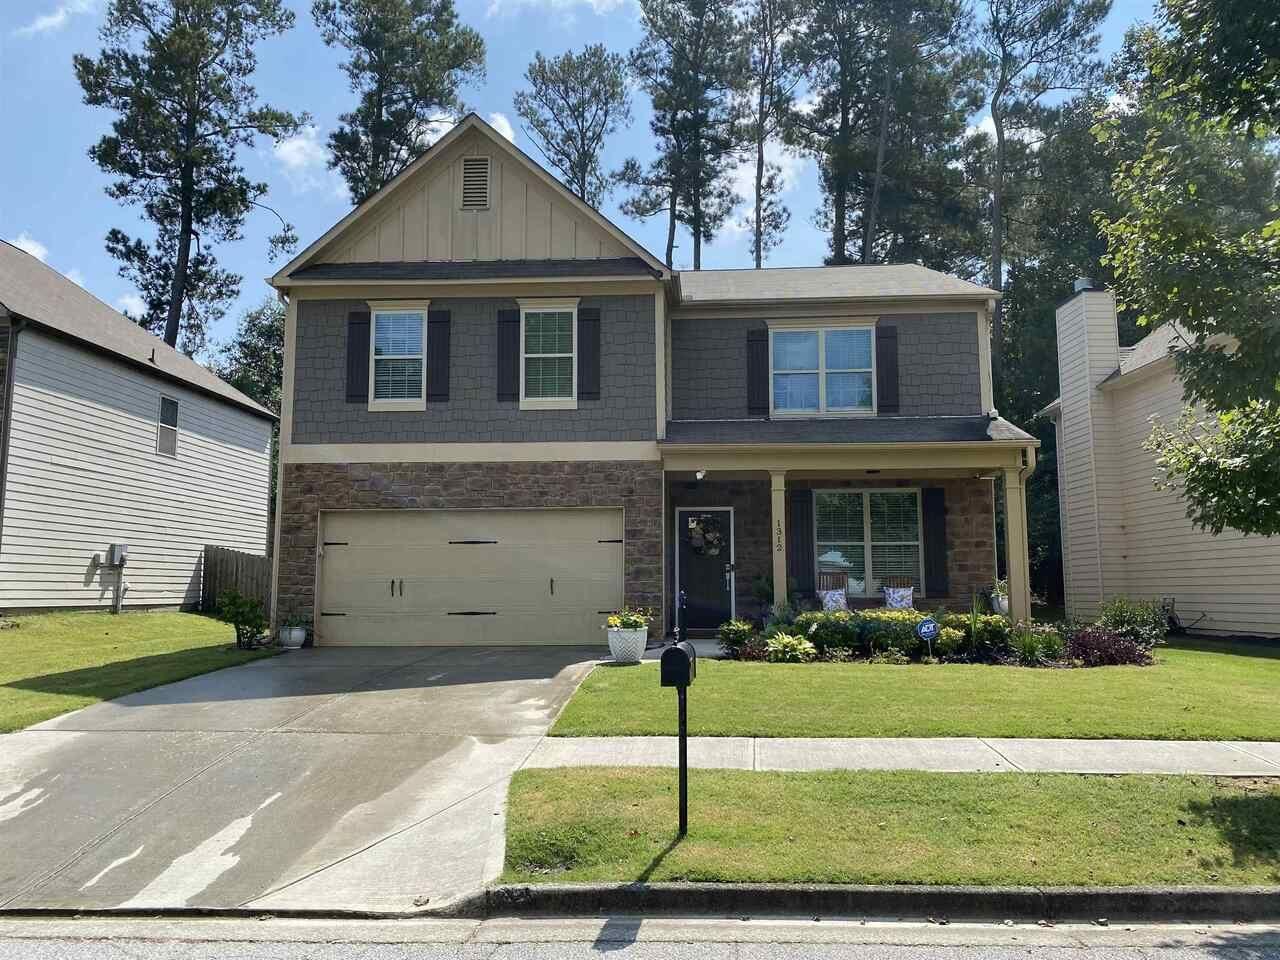 1312 Thomas Daniel Way, Lawrenceville, GA 30045 - #: 9052286